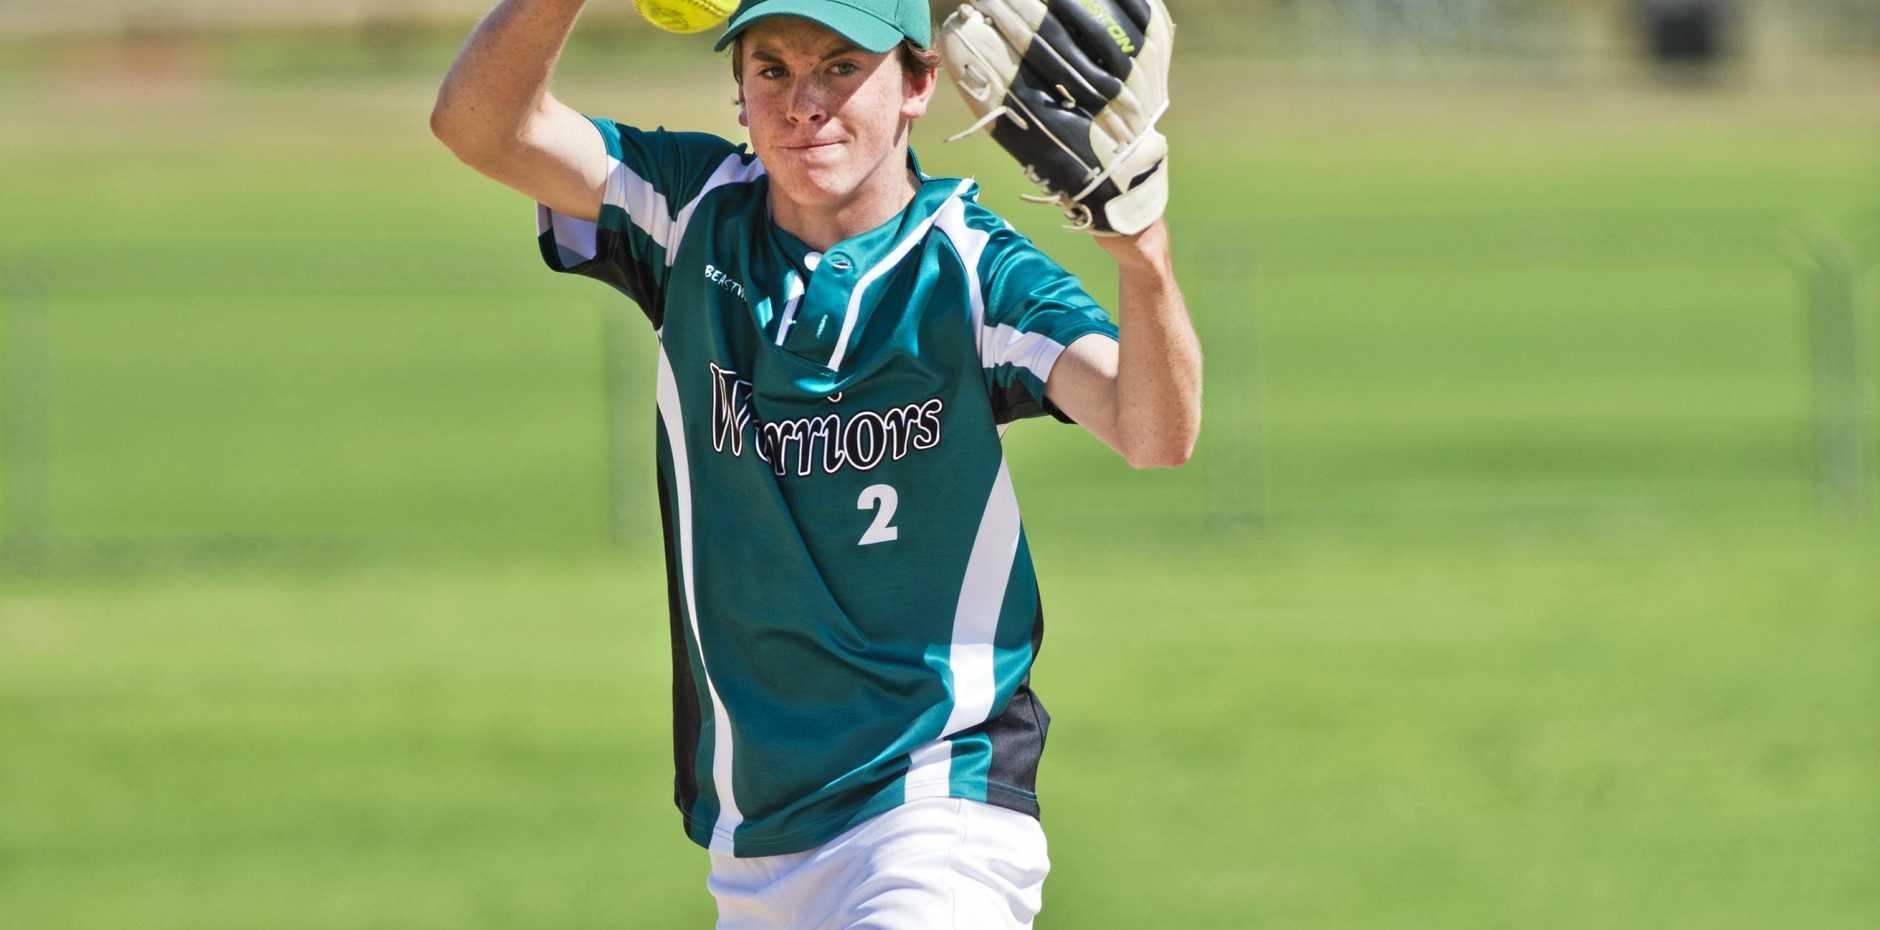 Toowoomba softball Nicholas Murphy has been named in the Australian under-17 boys squad.